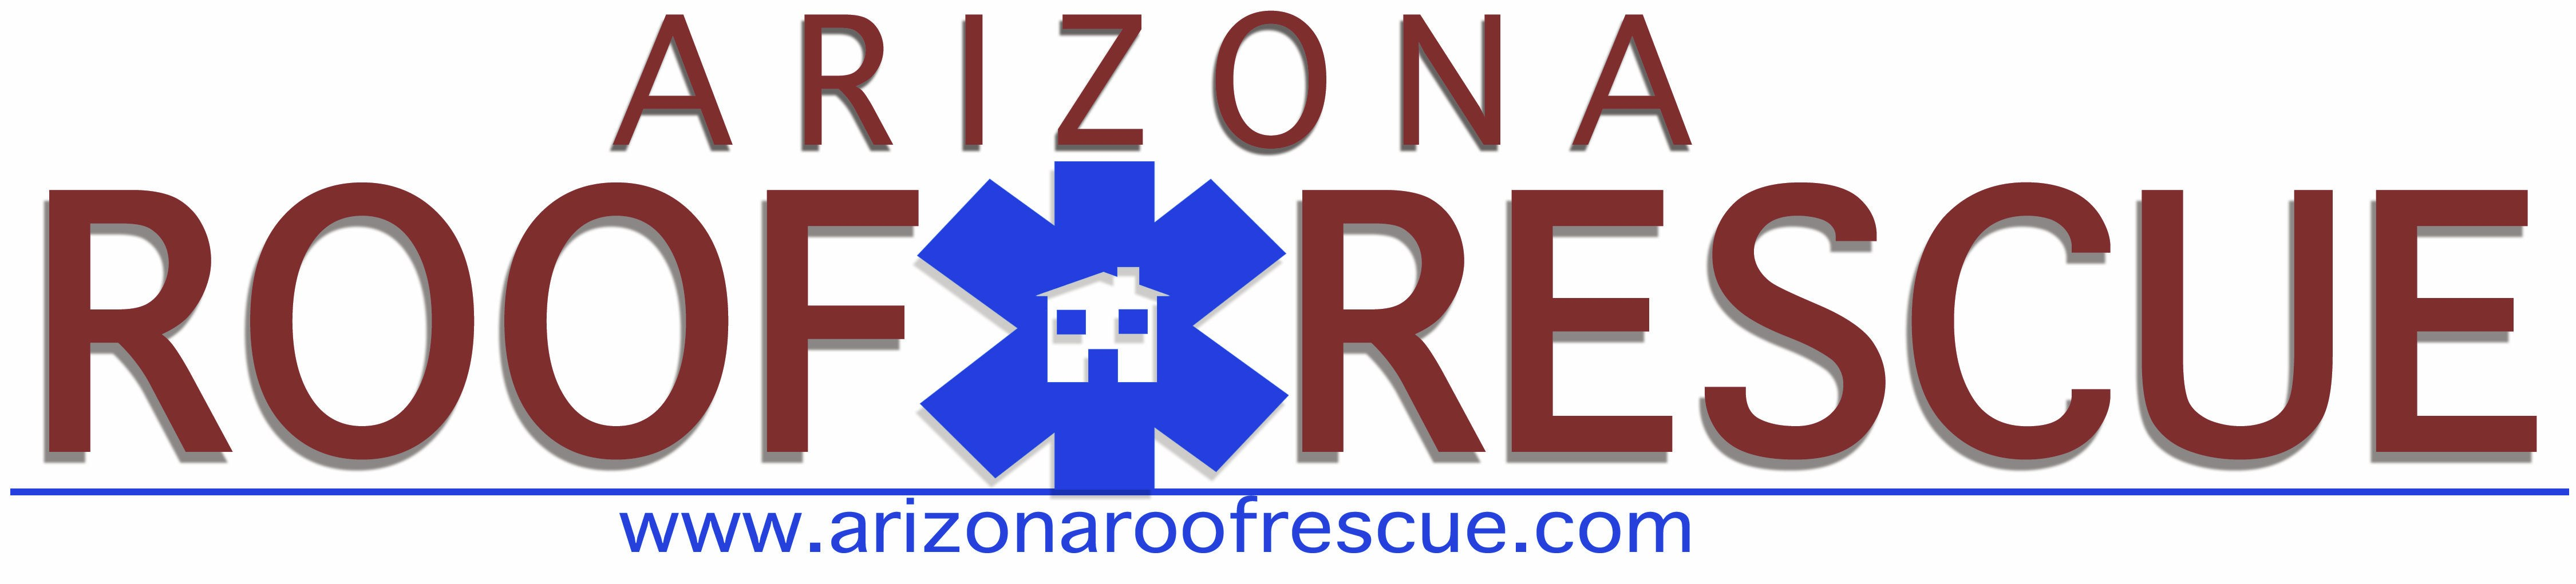 Arizona Roof Rescue logo